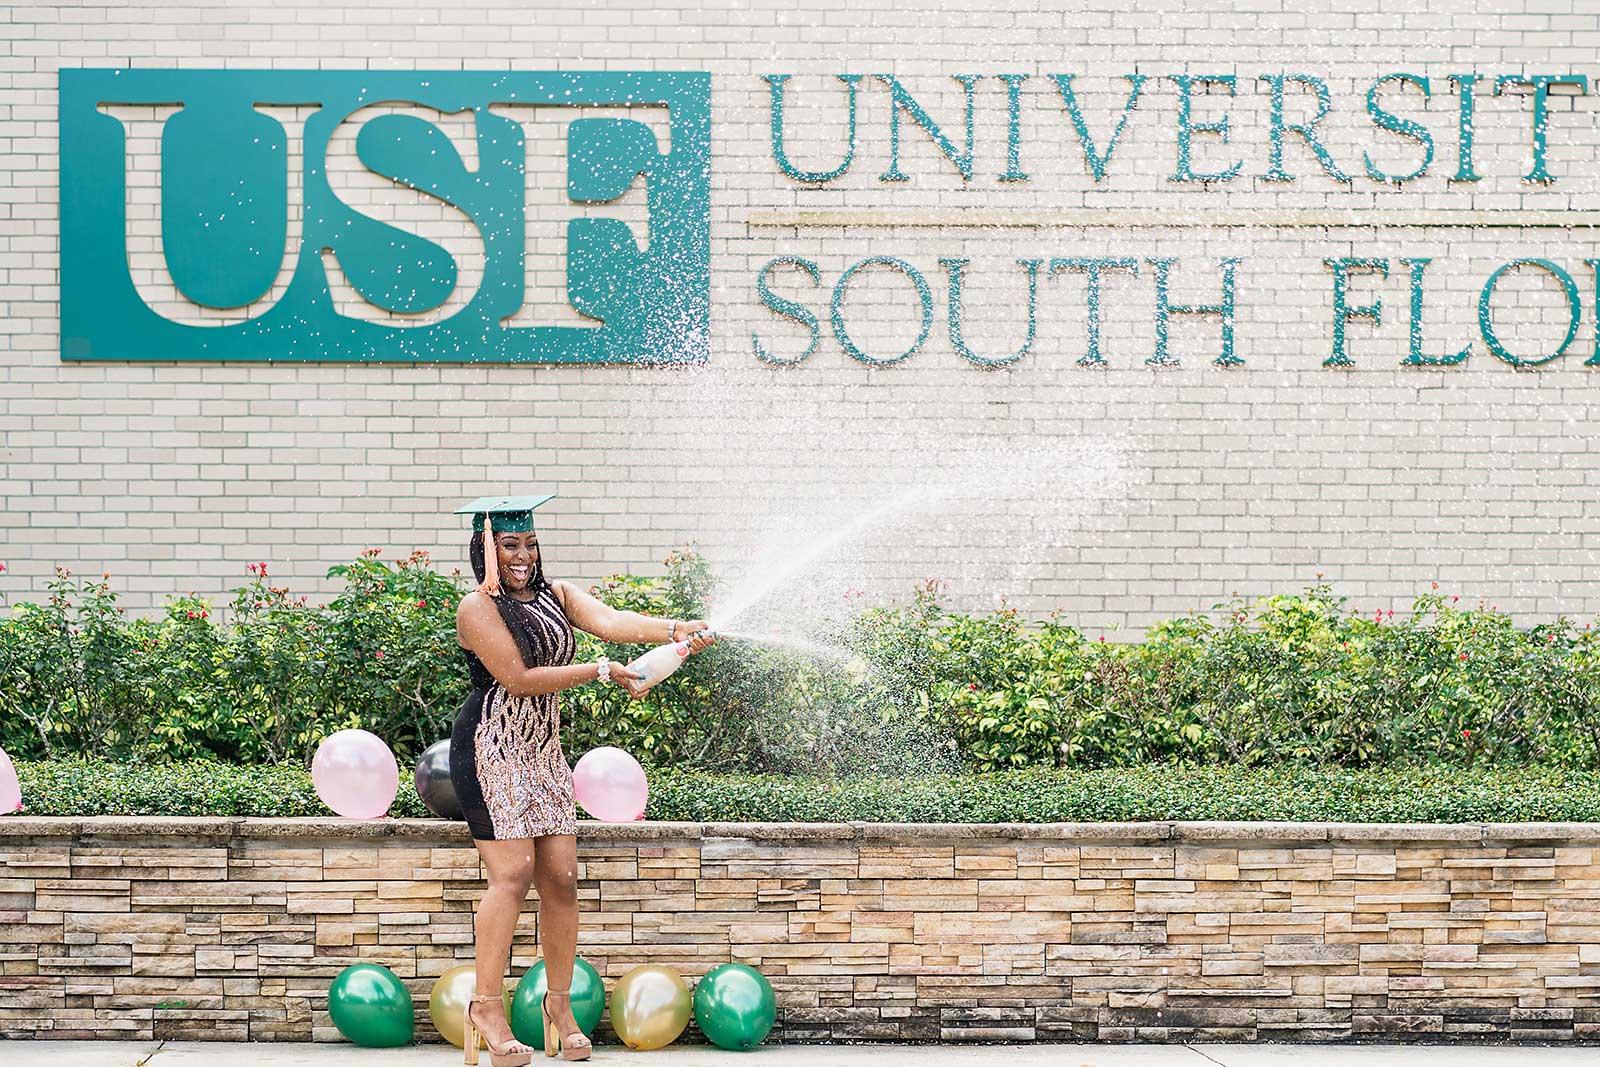 5 Expert Reasons to Make Your Graduation Photoshoot Monumental